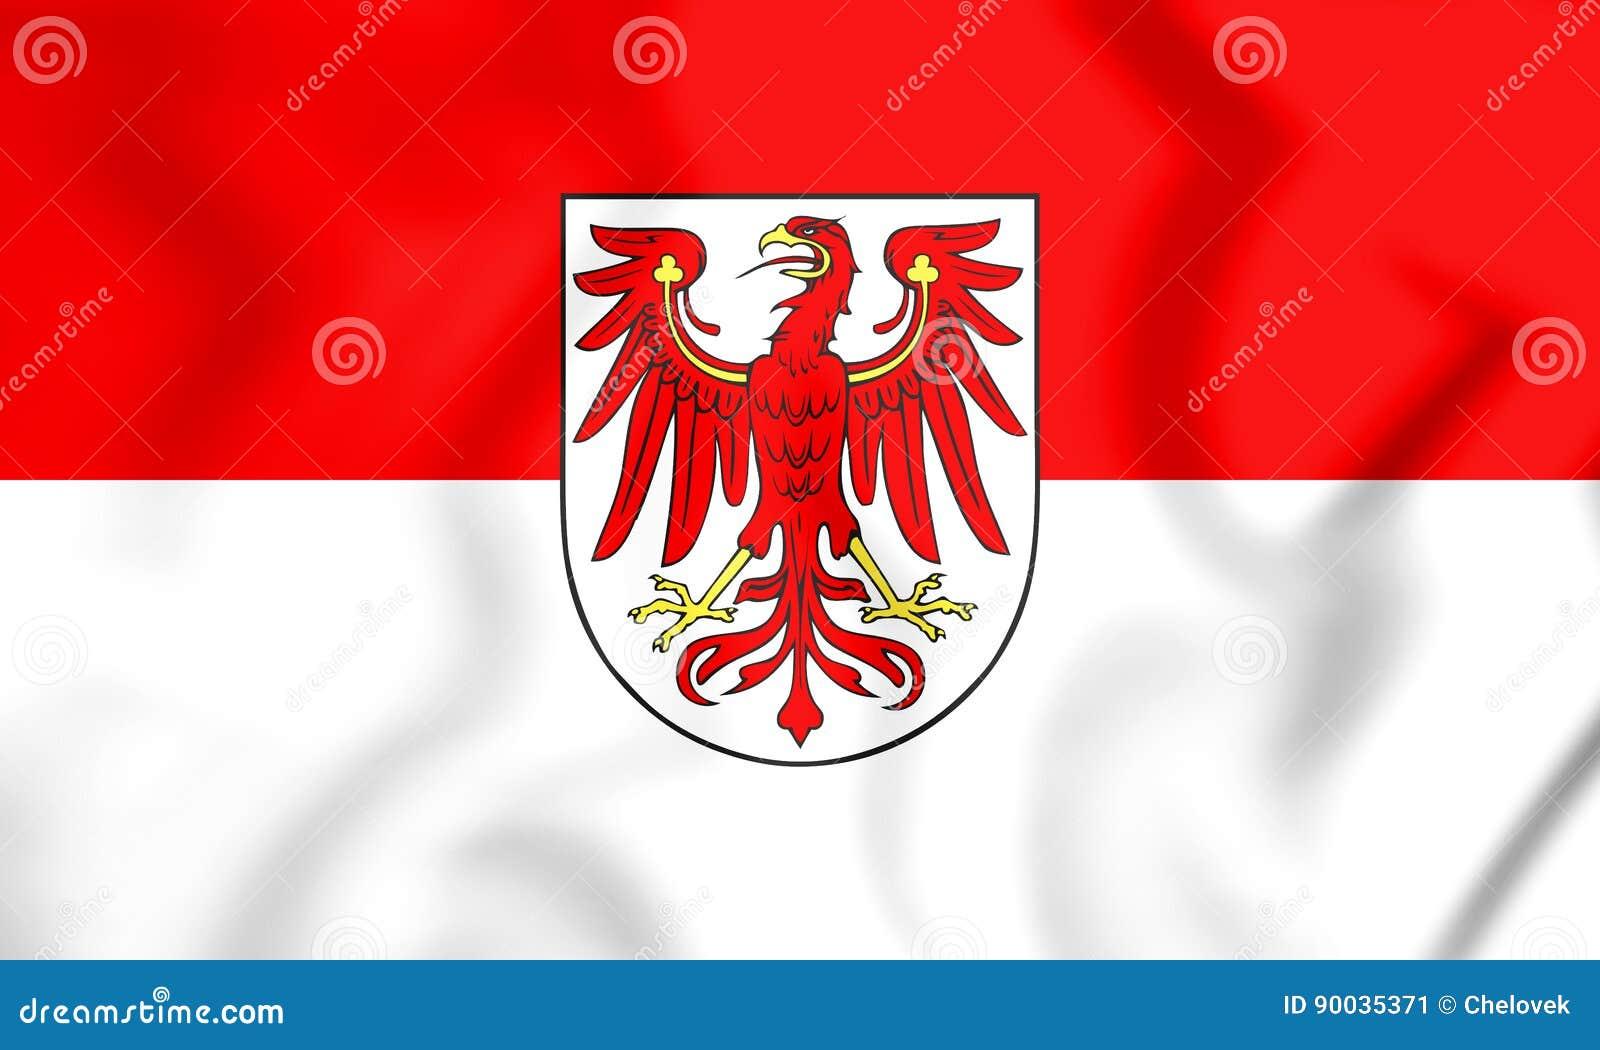 Bandiera della terra di brandeburgo germania - Bandiera della pagina di colorazione della germania ...